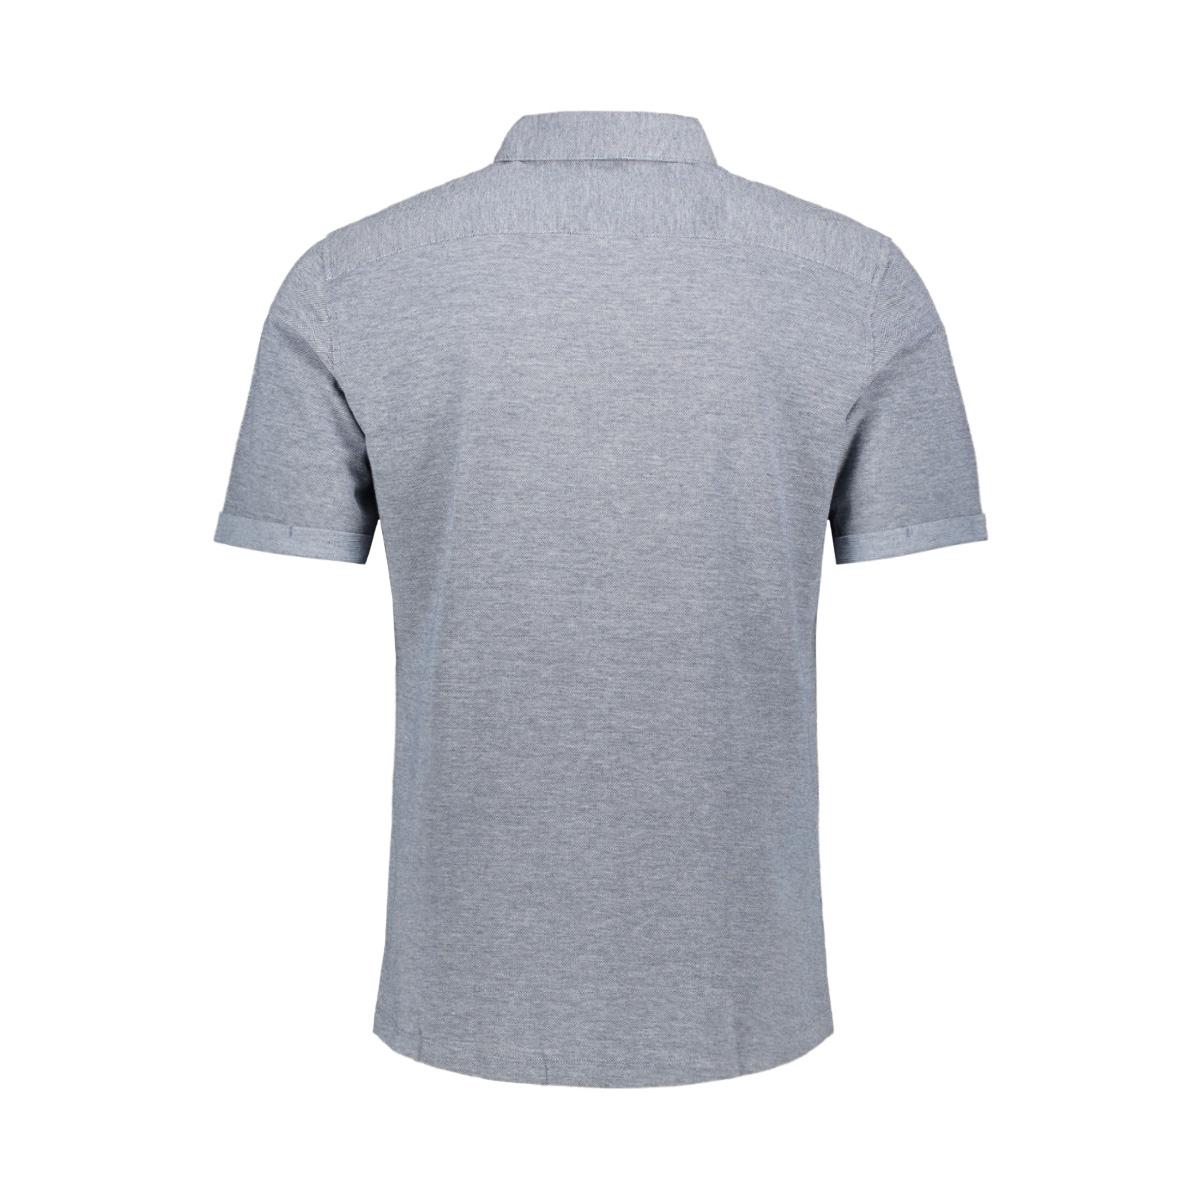 onscuton ss knitted melange shirt r 22011833 only & sons overhemd majolica blue